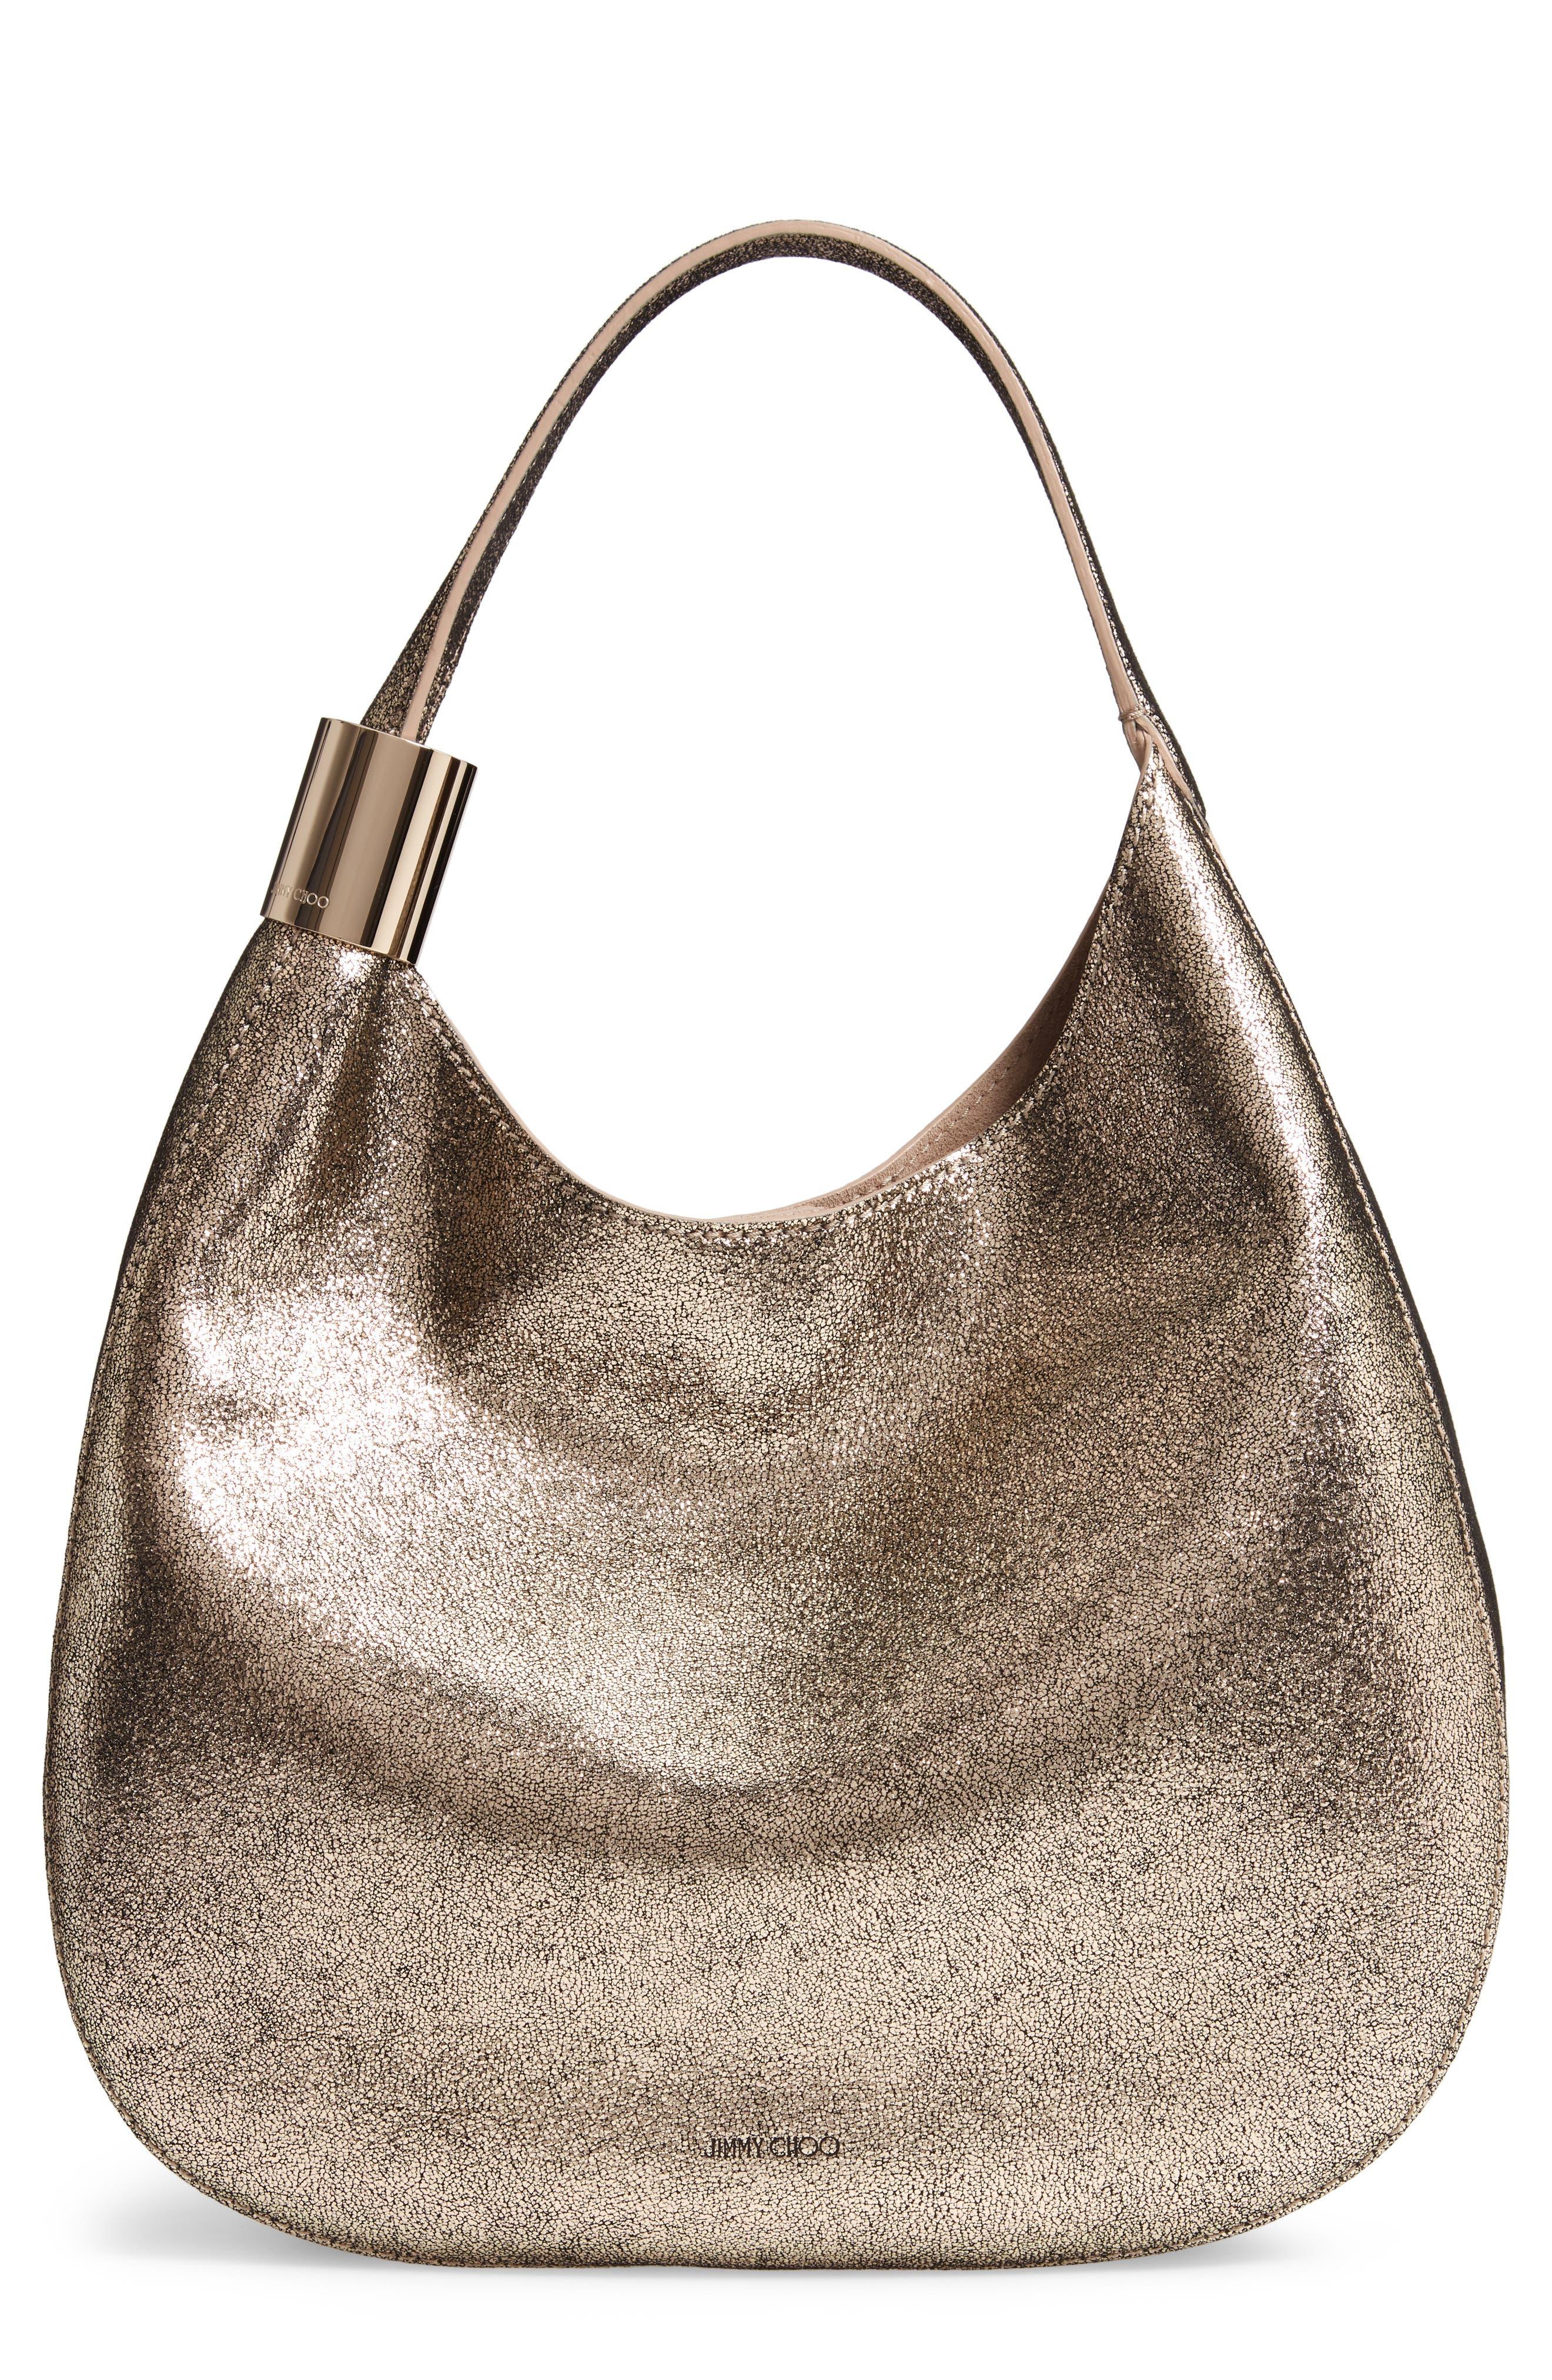 Steve Metallic Leather Hobo,                         Main,                         color, CHAMPAGNE